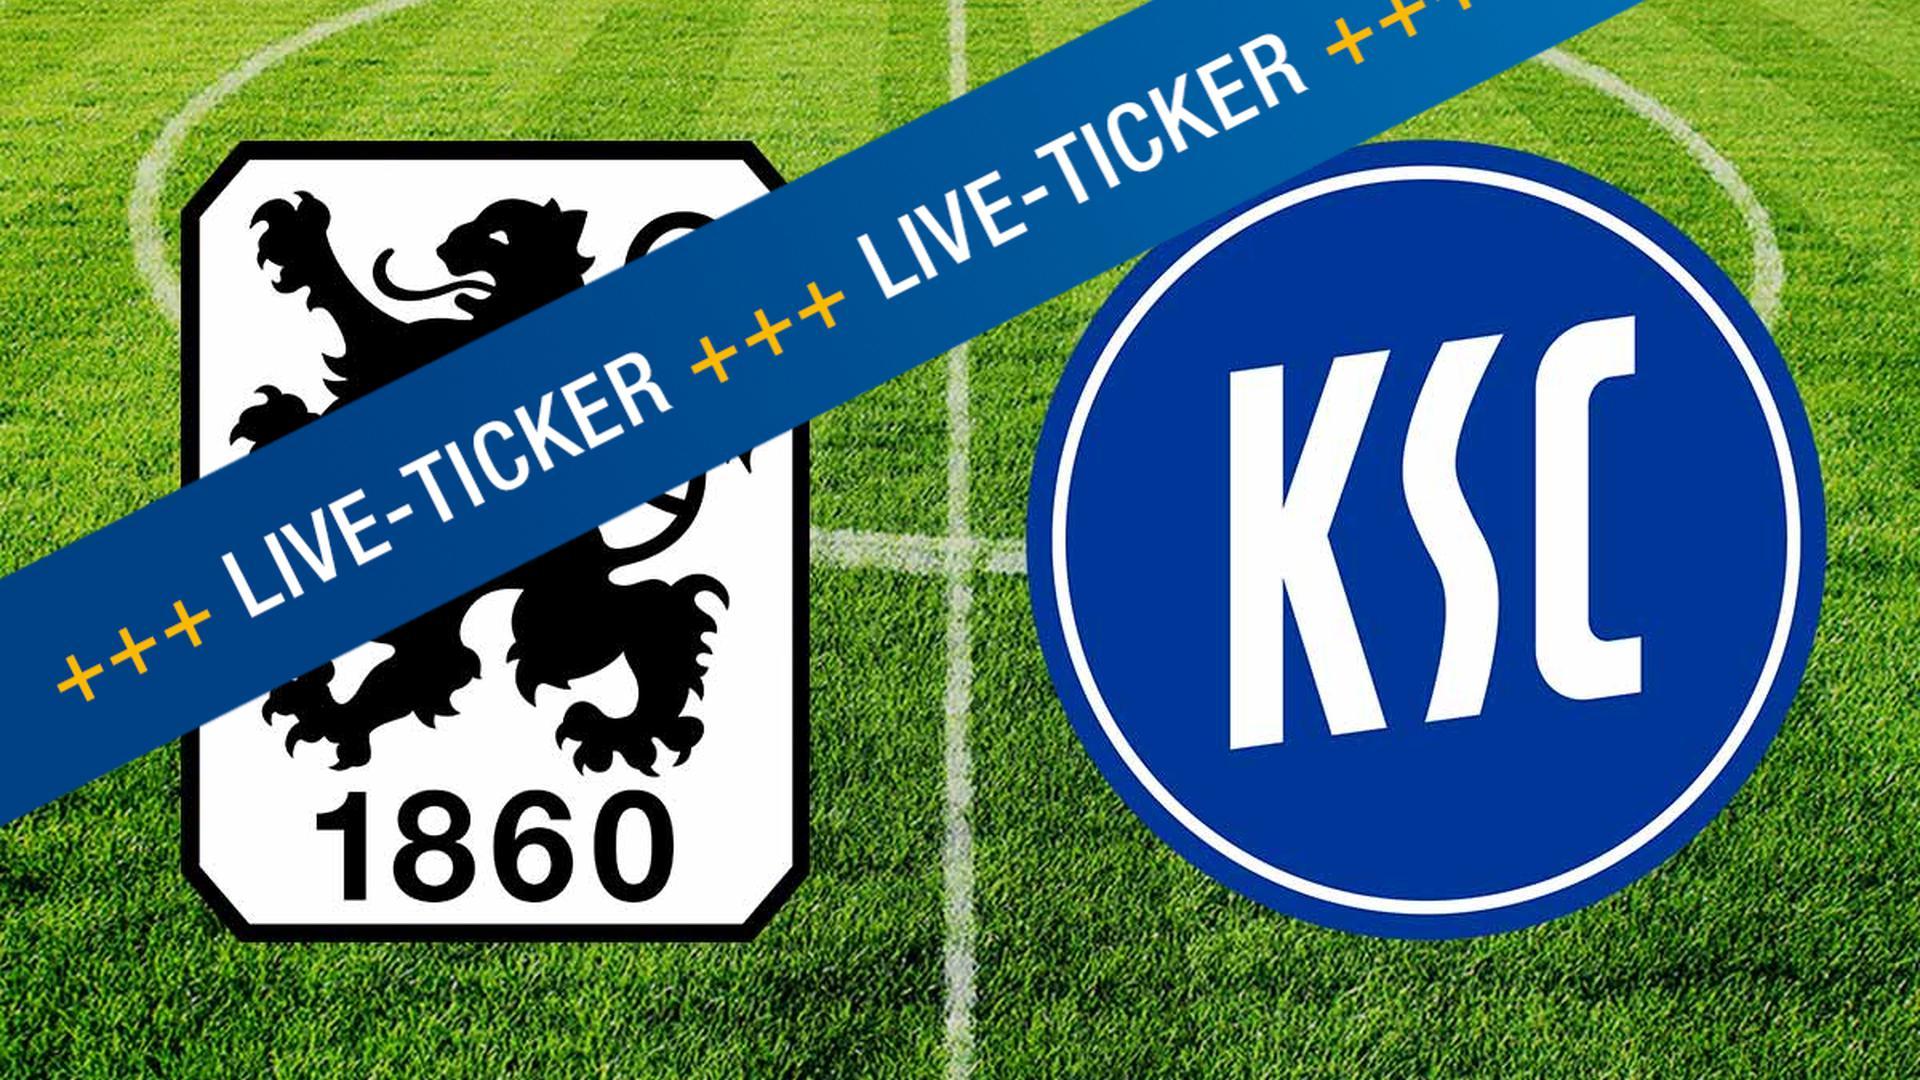 Ksc Live Ticker